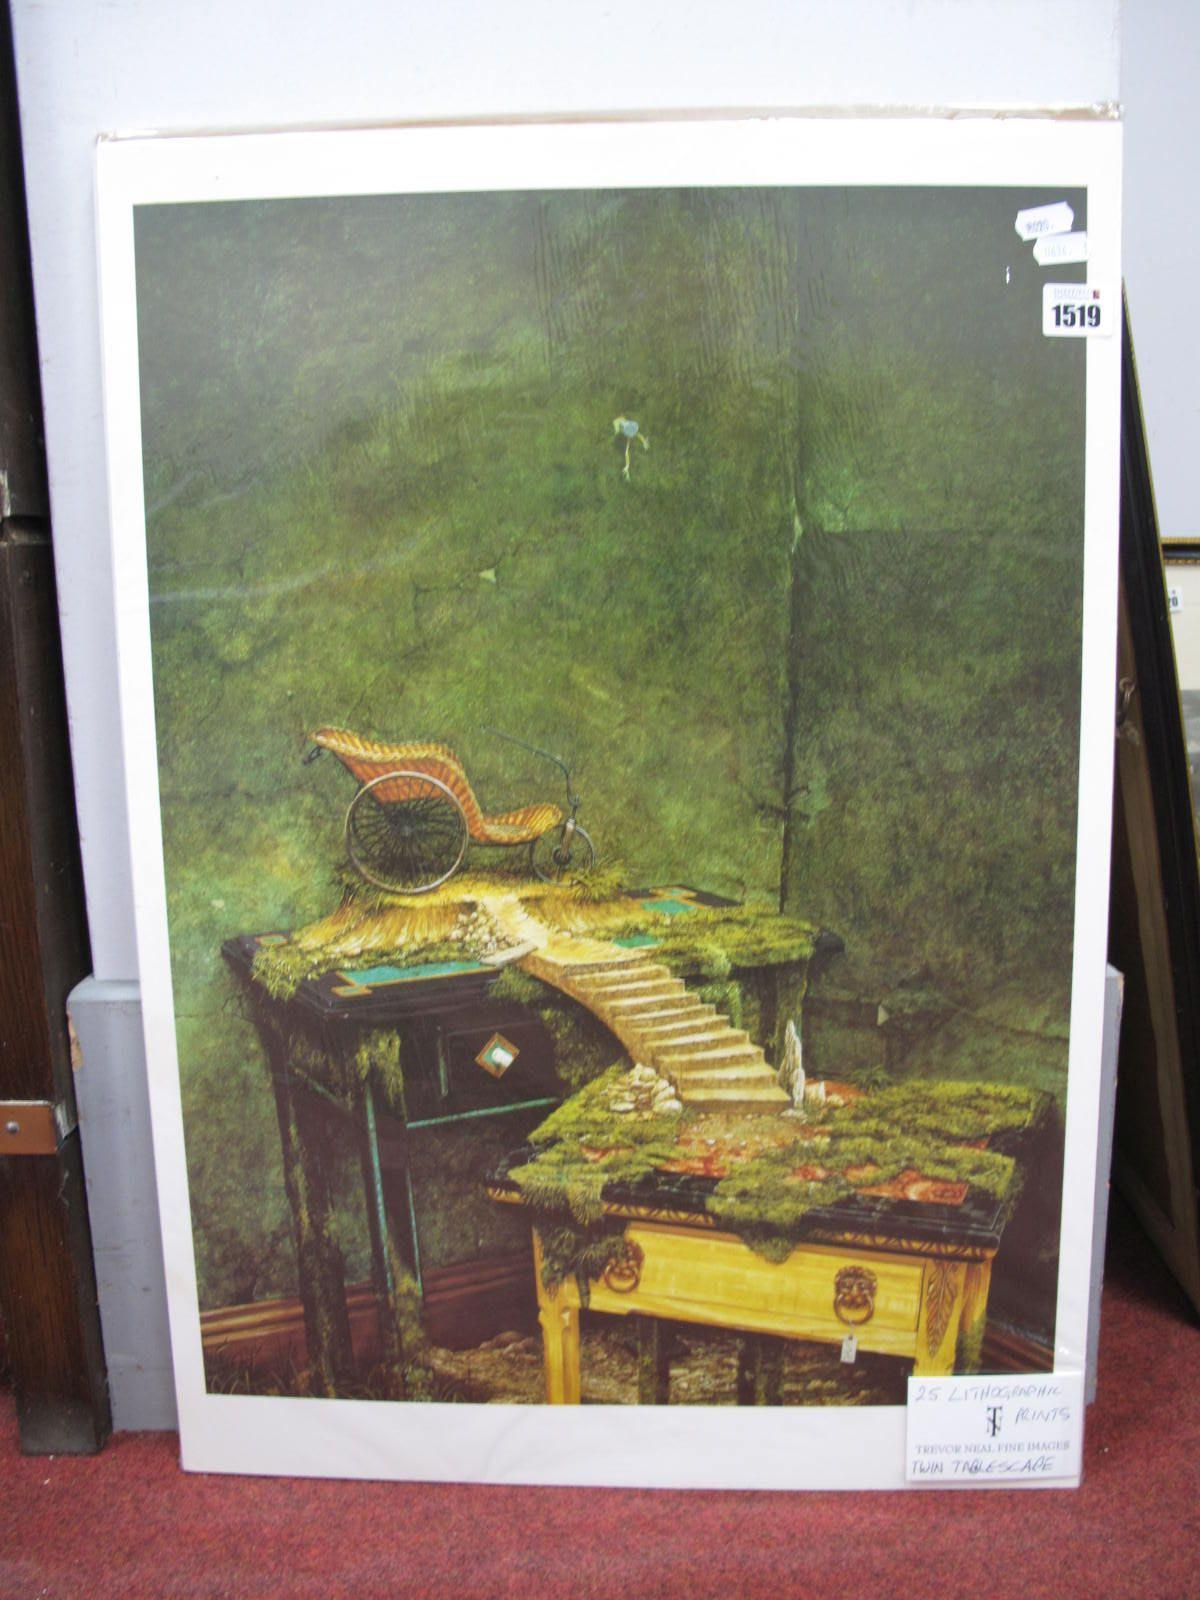 Trevor Neal (Sheffield Artist) 'Twin Tablescape' Lithographic Prints, images 57 x 42cm, twenty